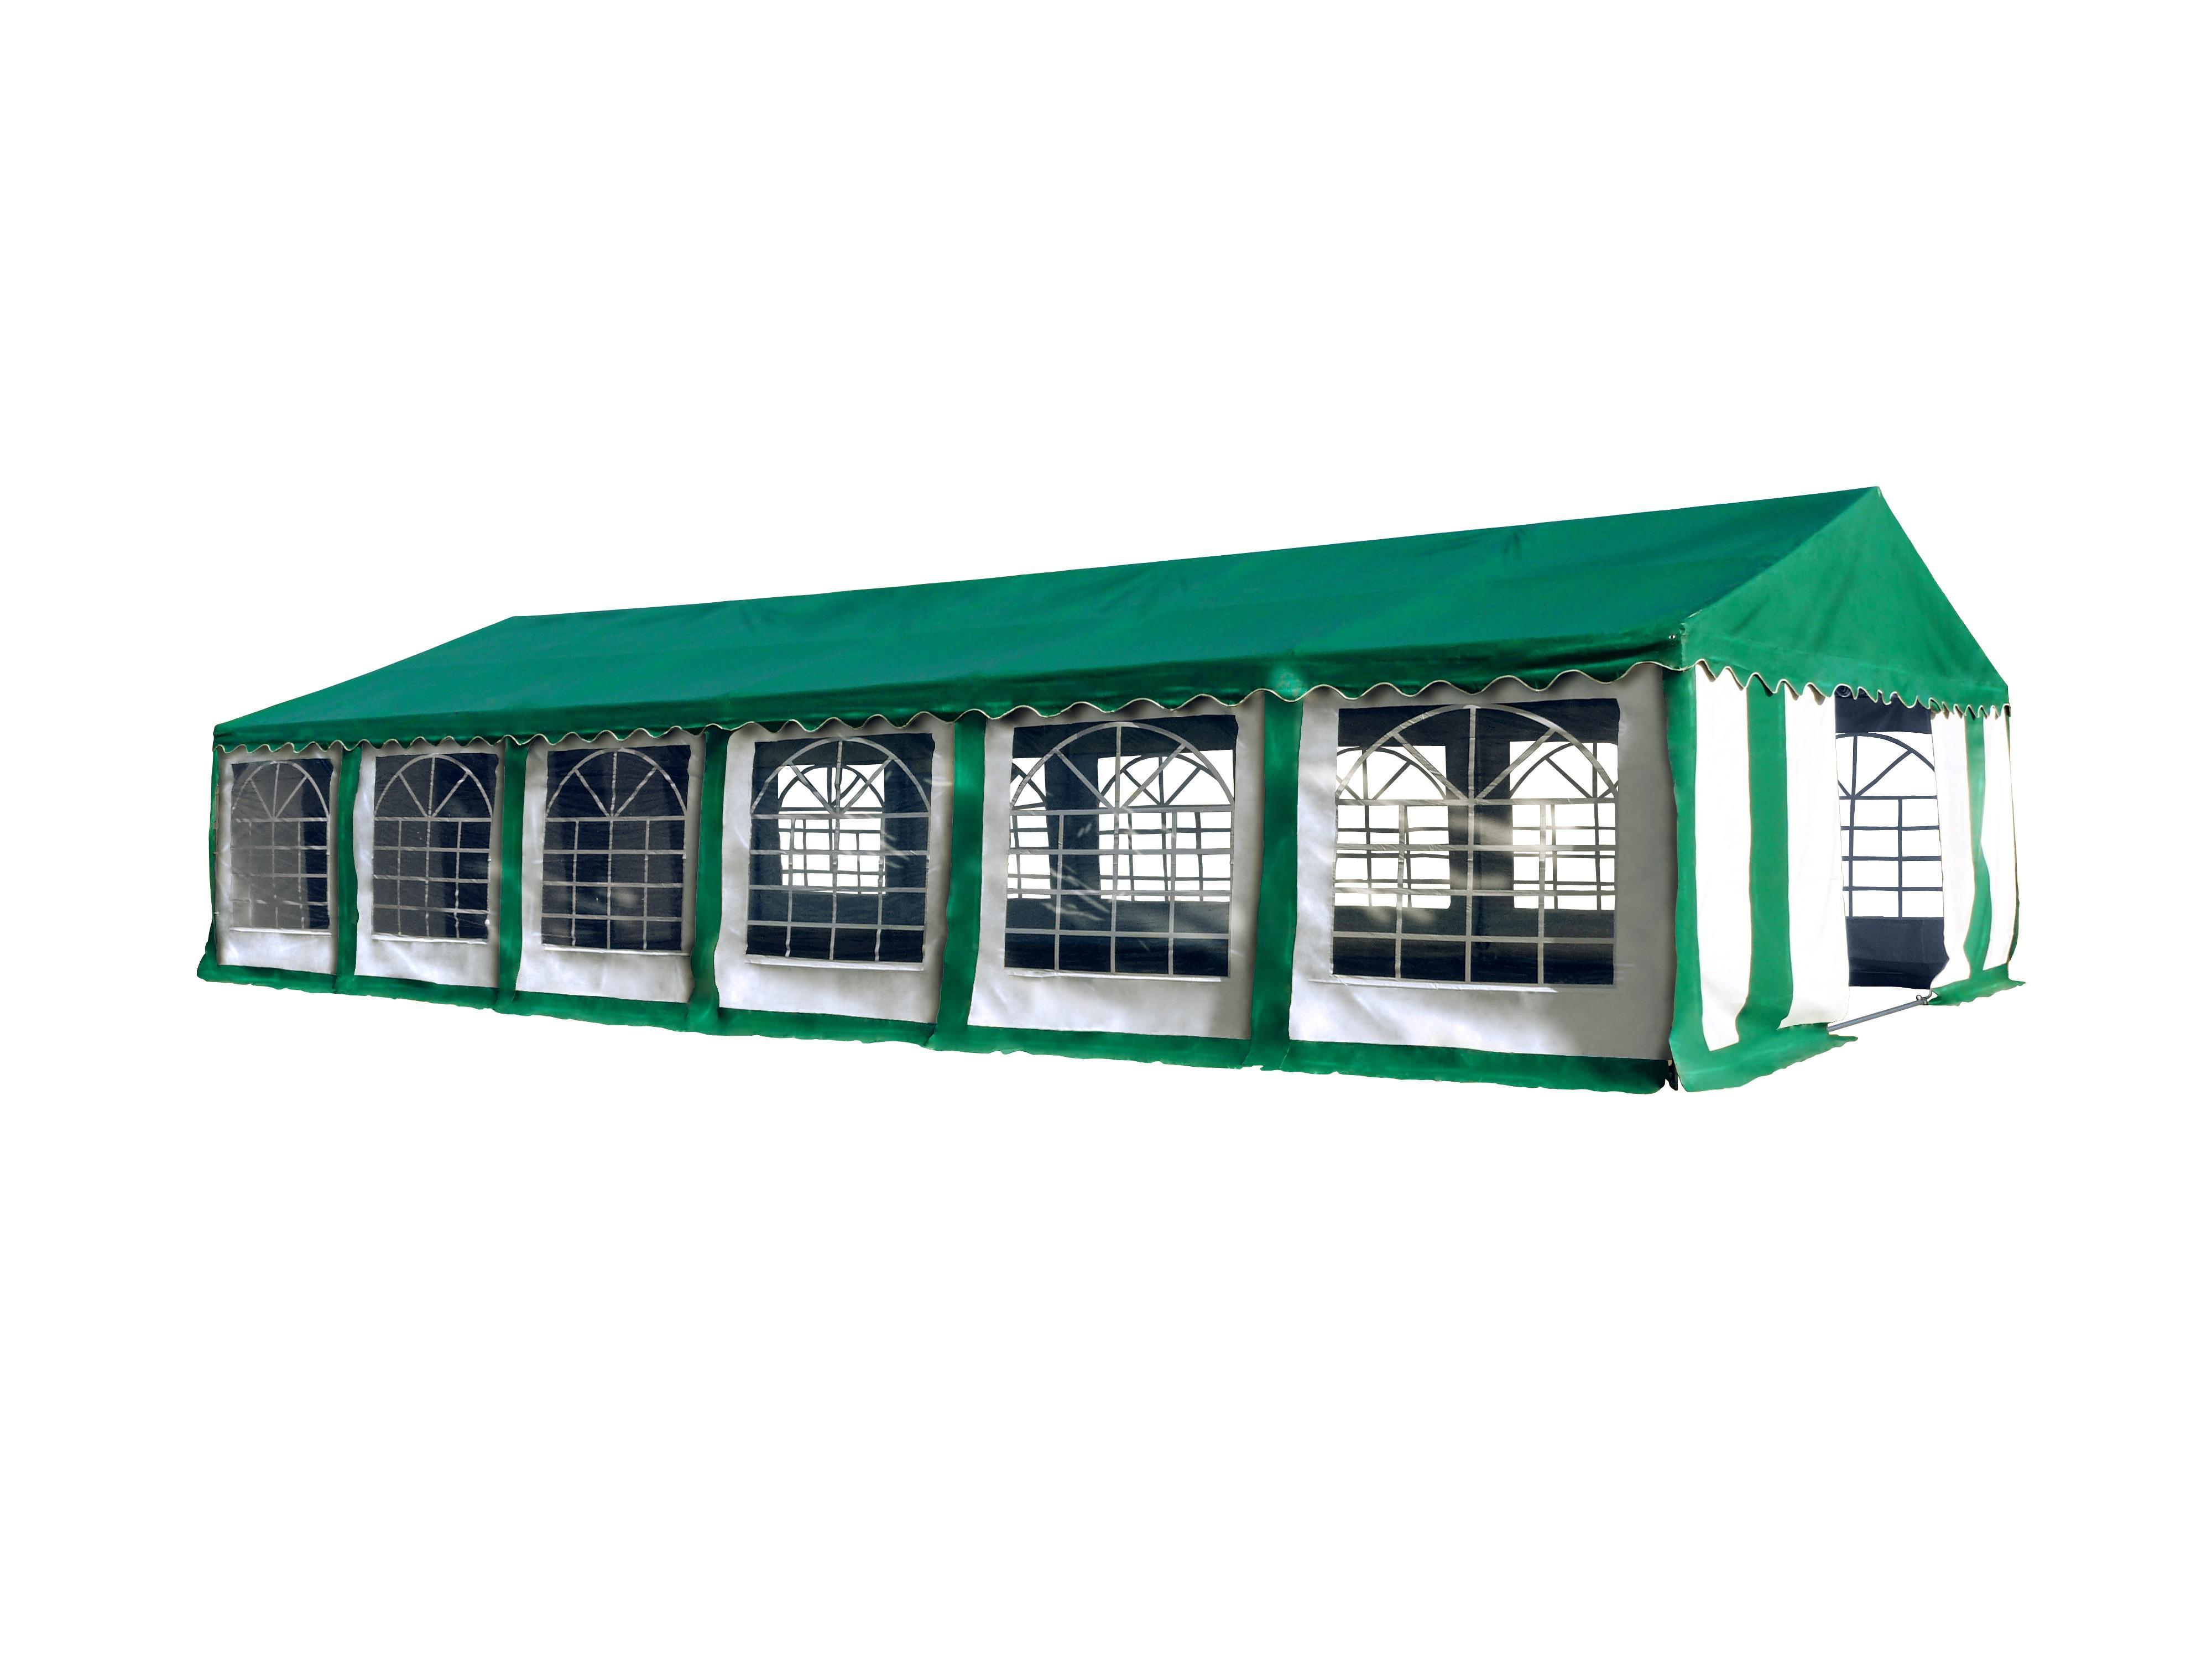 Hawaj Párty stan Premium 6 x 12 m zeleno-bílý se zelenou střechou